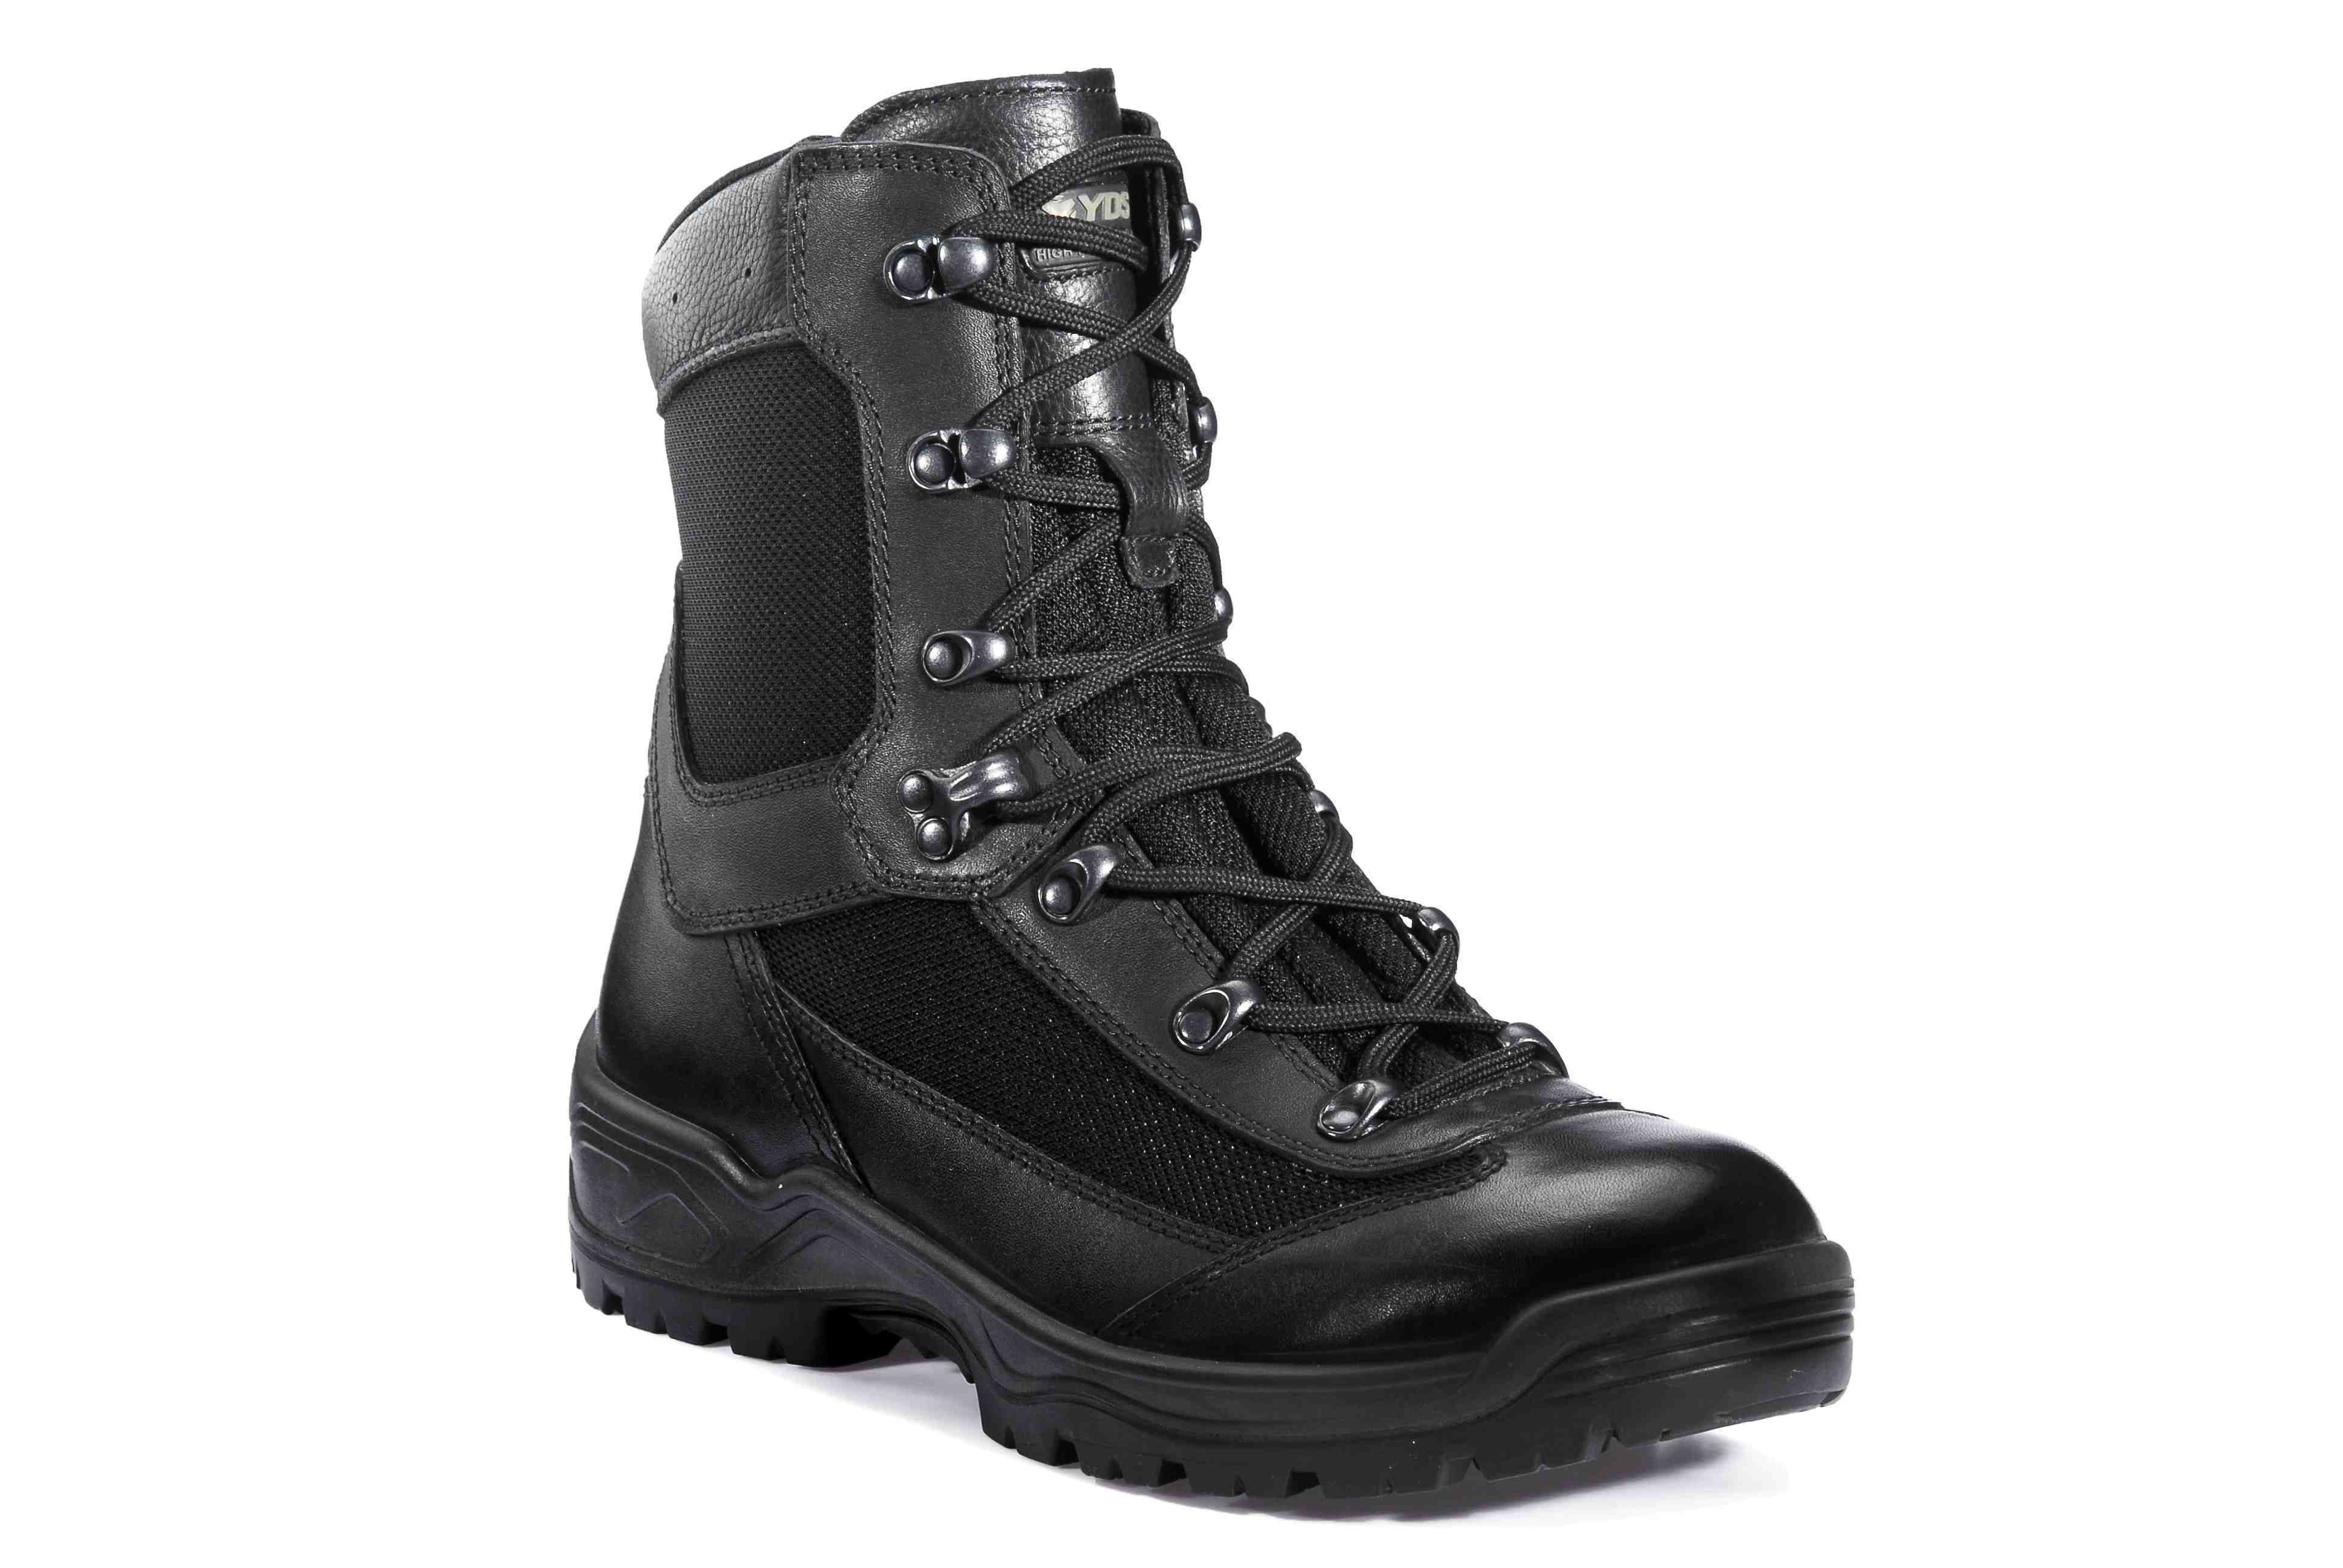 LeBOCK YDS Eagle Combat Boot 02 HRO WO FO